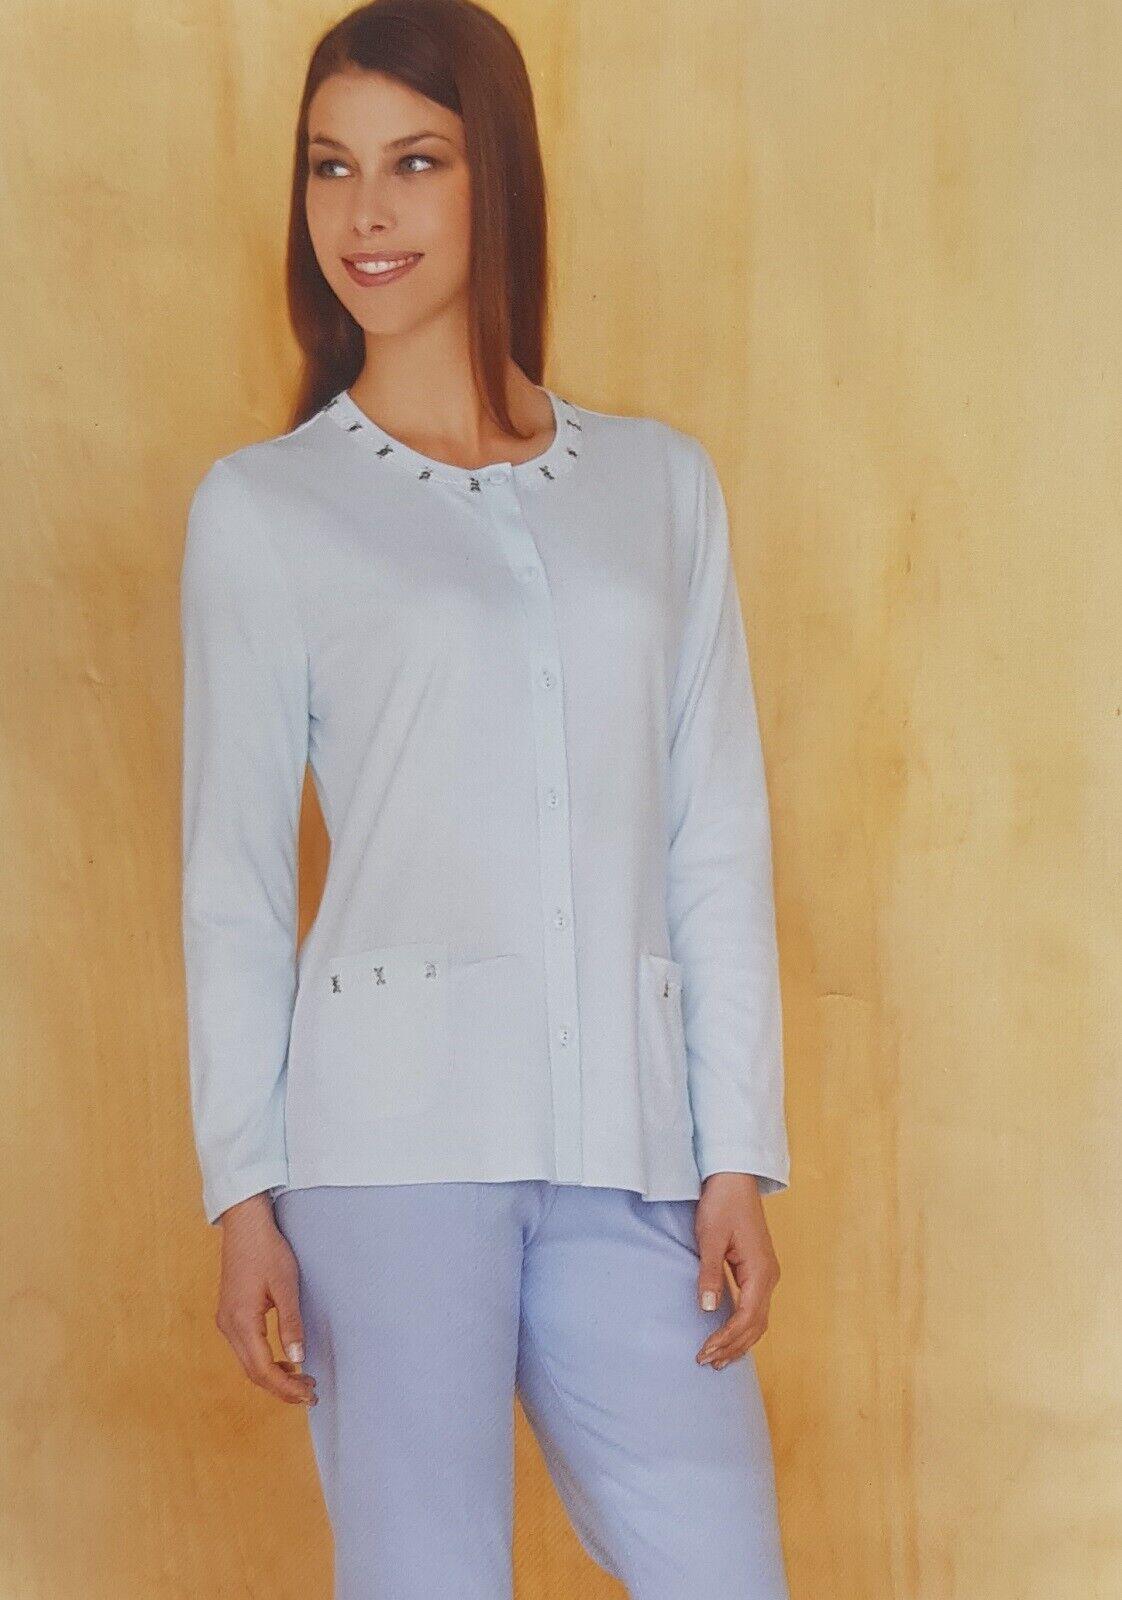 Women's Pajamas Winter Open Linclalor Warm Cotton 100% 91110 Maxi Outsize